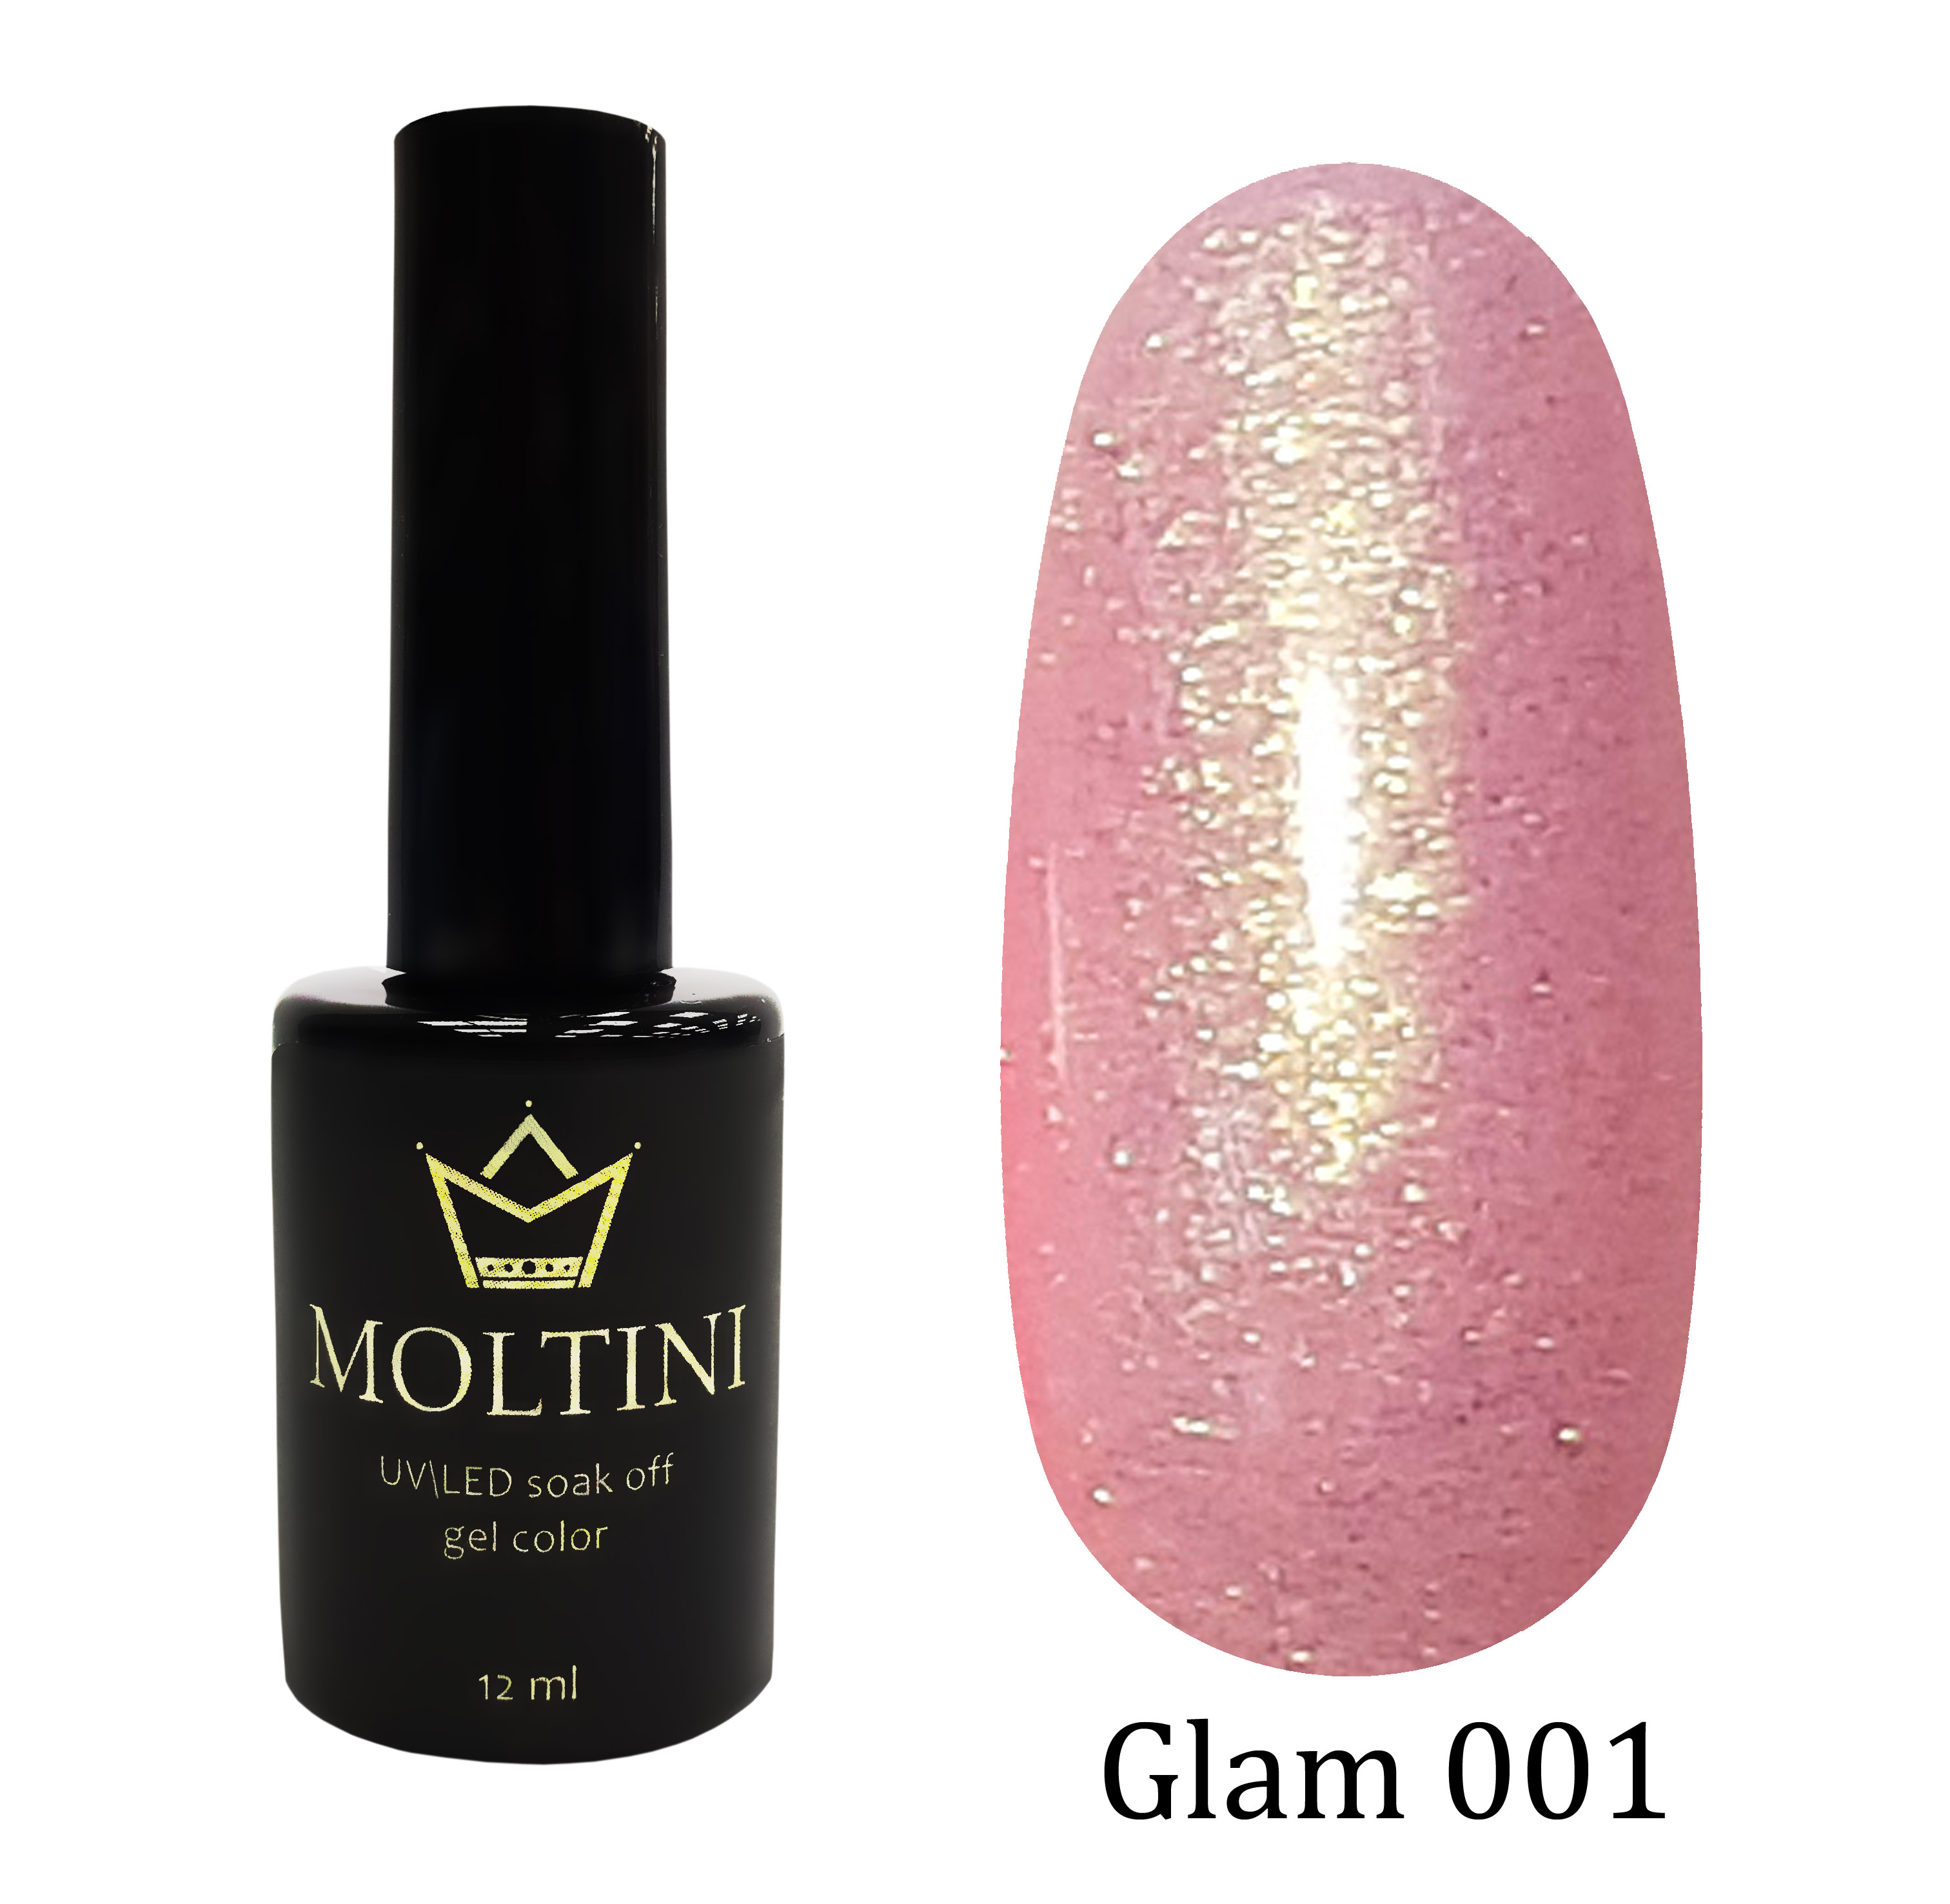 Гель-лак Moltini GLAM 001, 12 ml